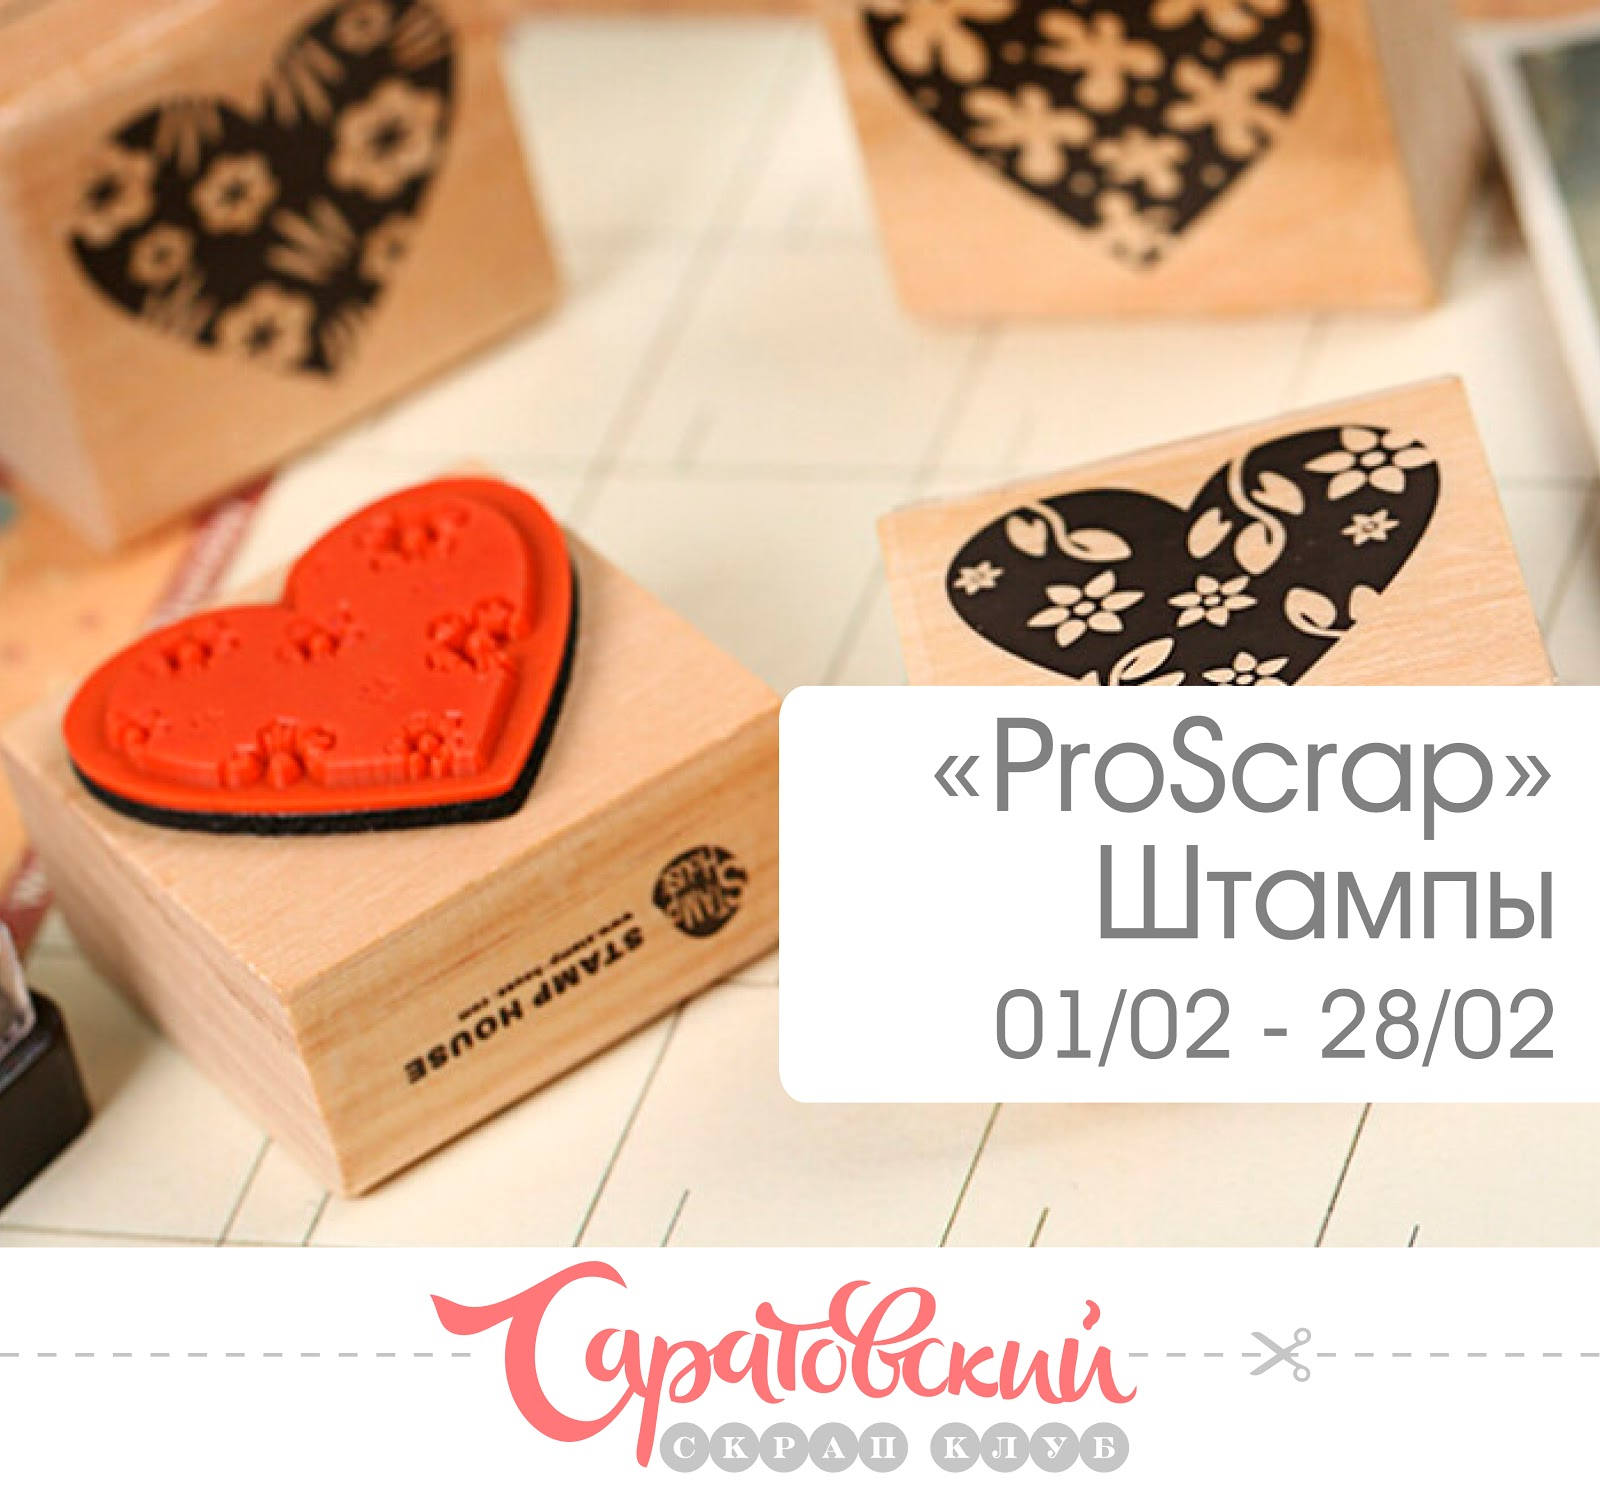 ССК: ProScrap. Штампы.